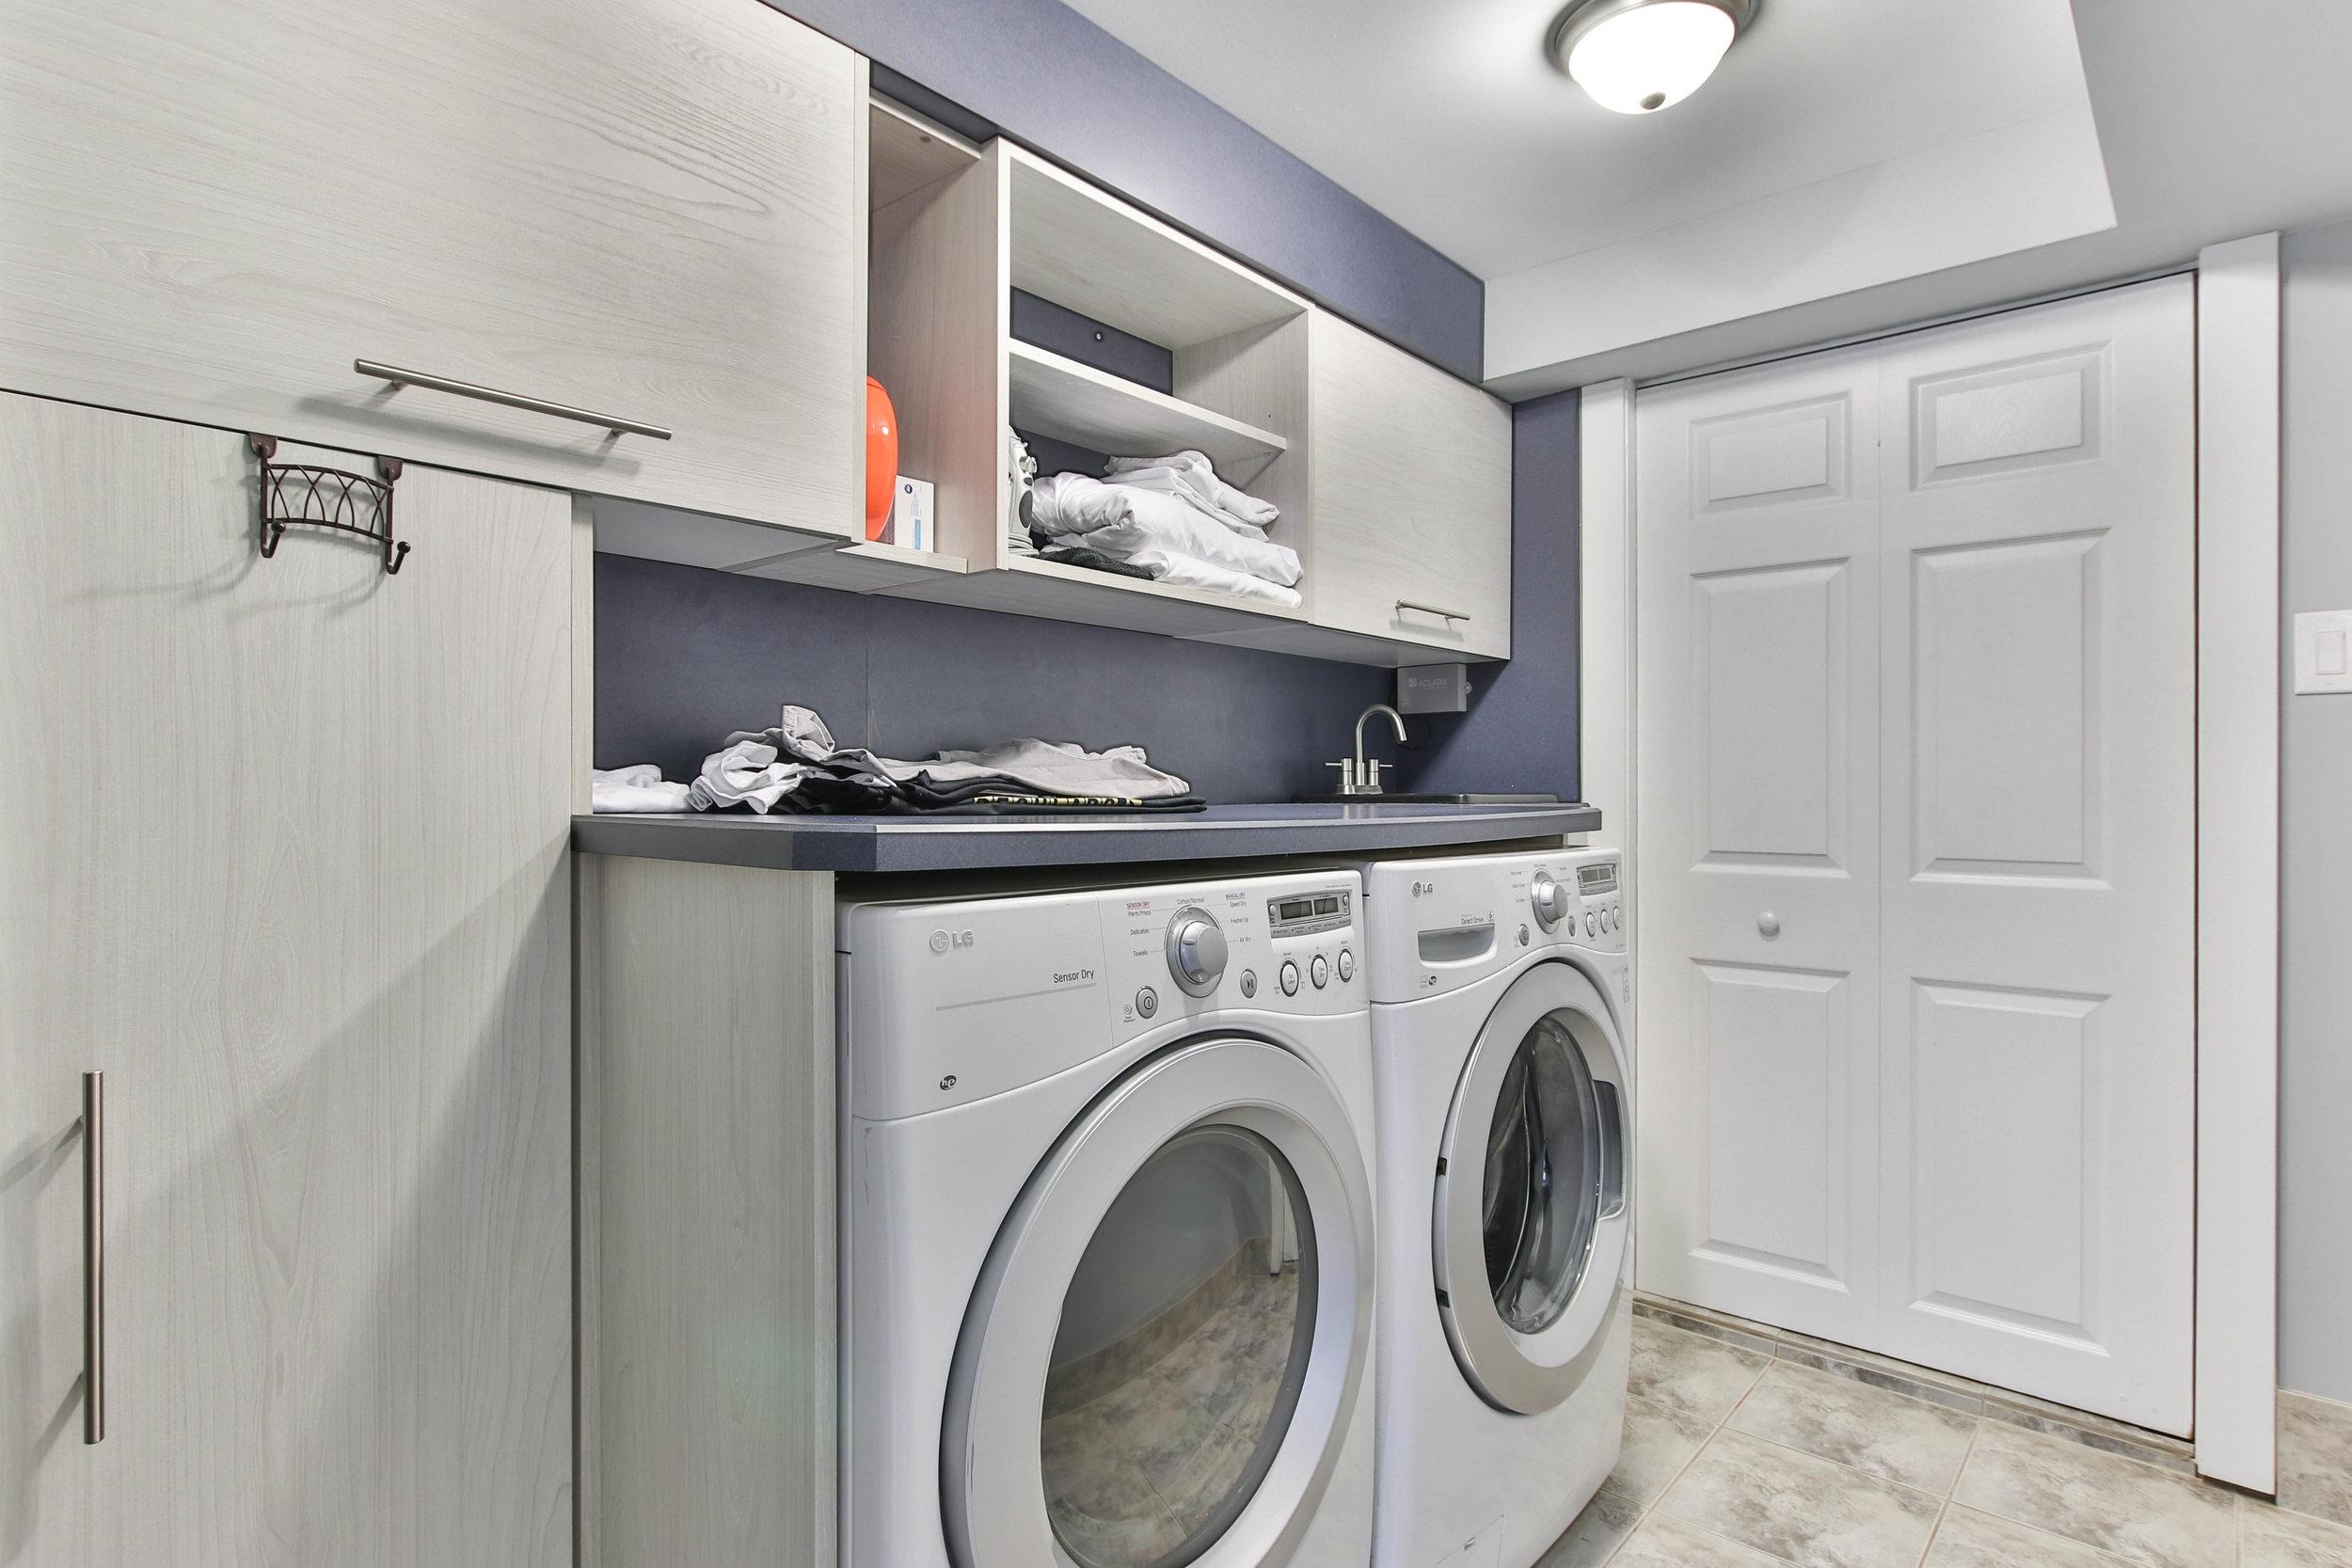 41_Laundry.jpg